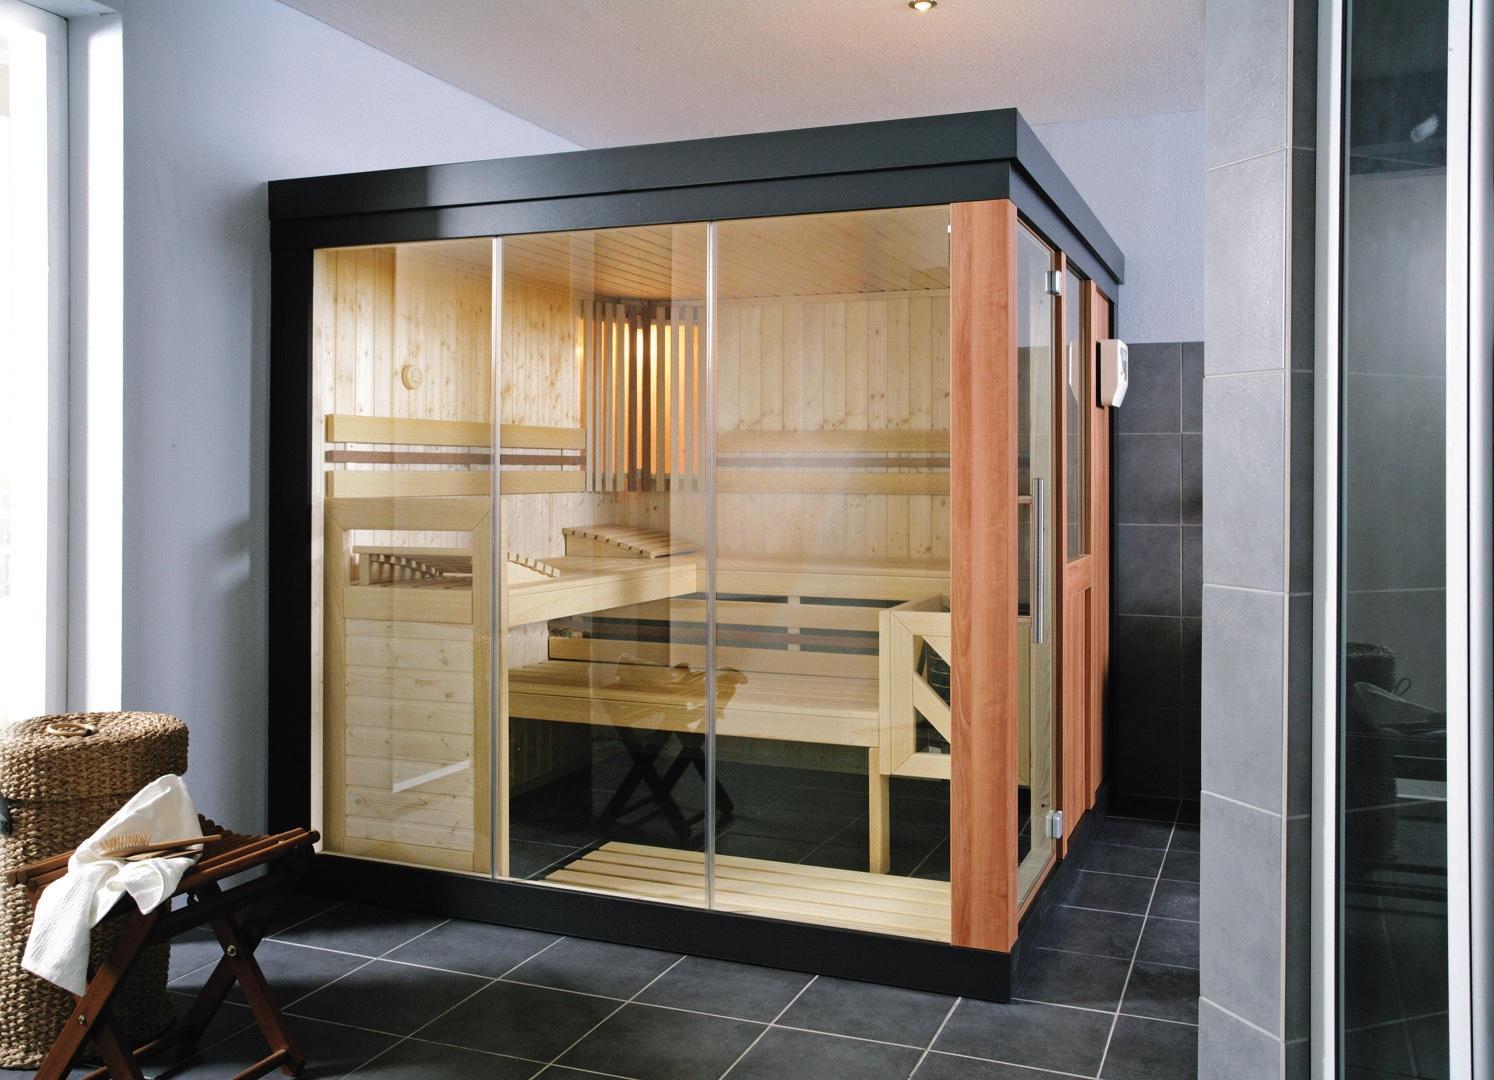 Saune finlandesi prezzi e offerte - Hammam exterieur bois ...